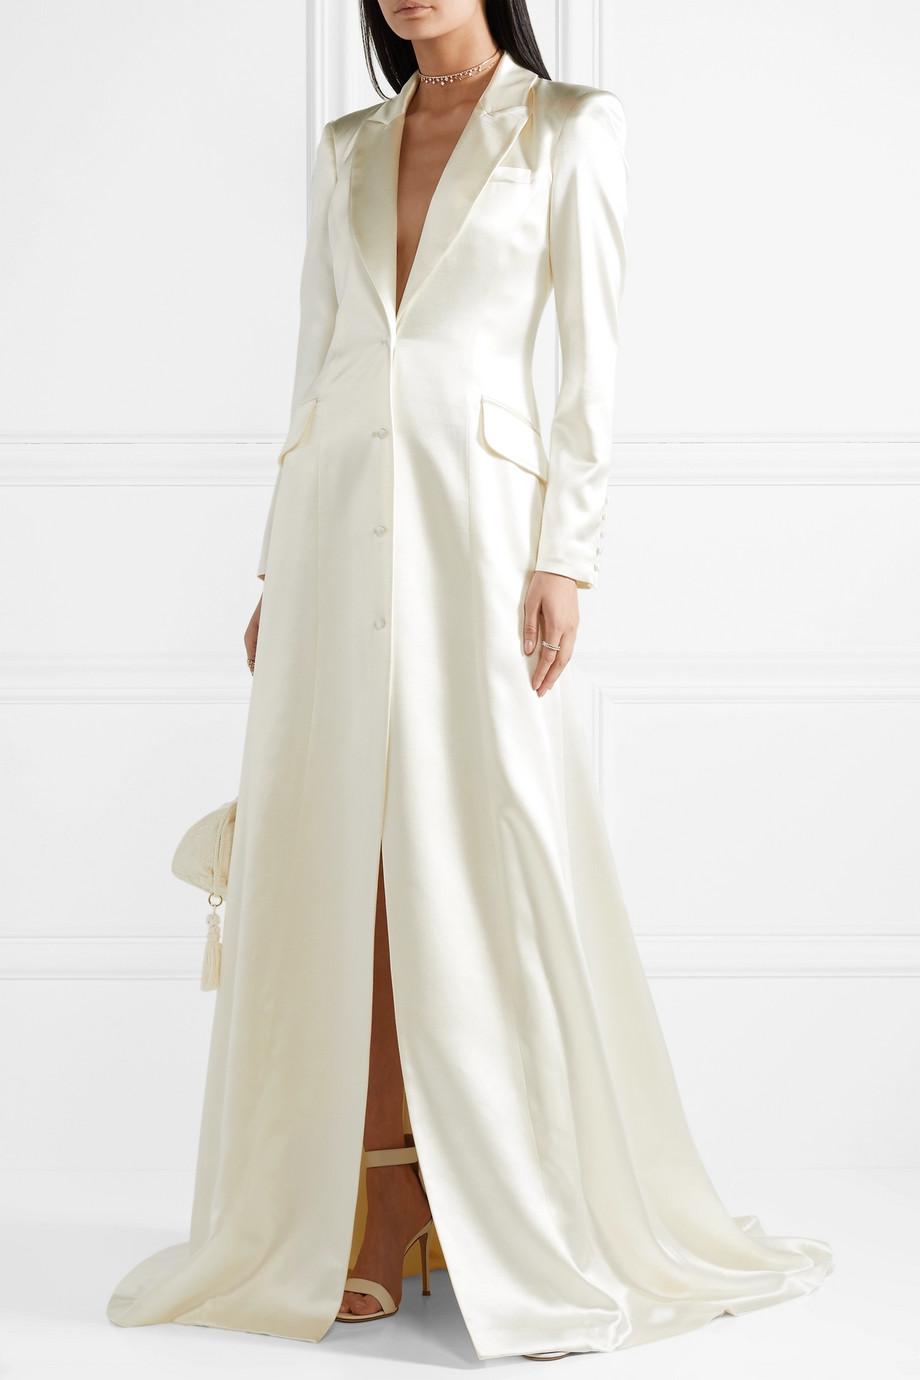 Danielle Frankel Jean silk and wool-blend satin coat